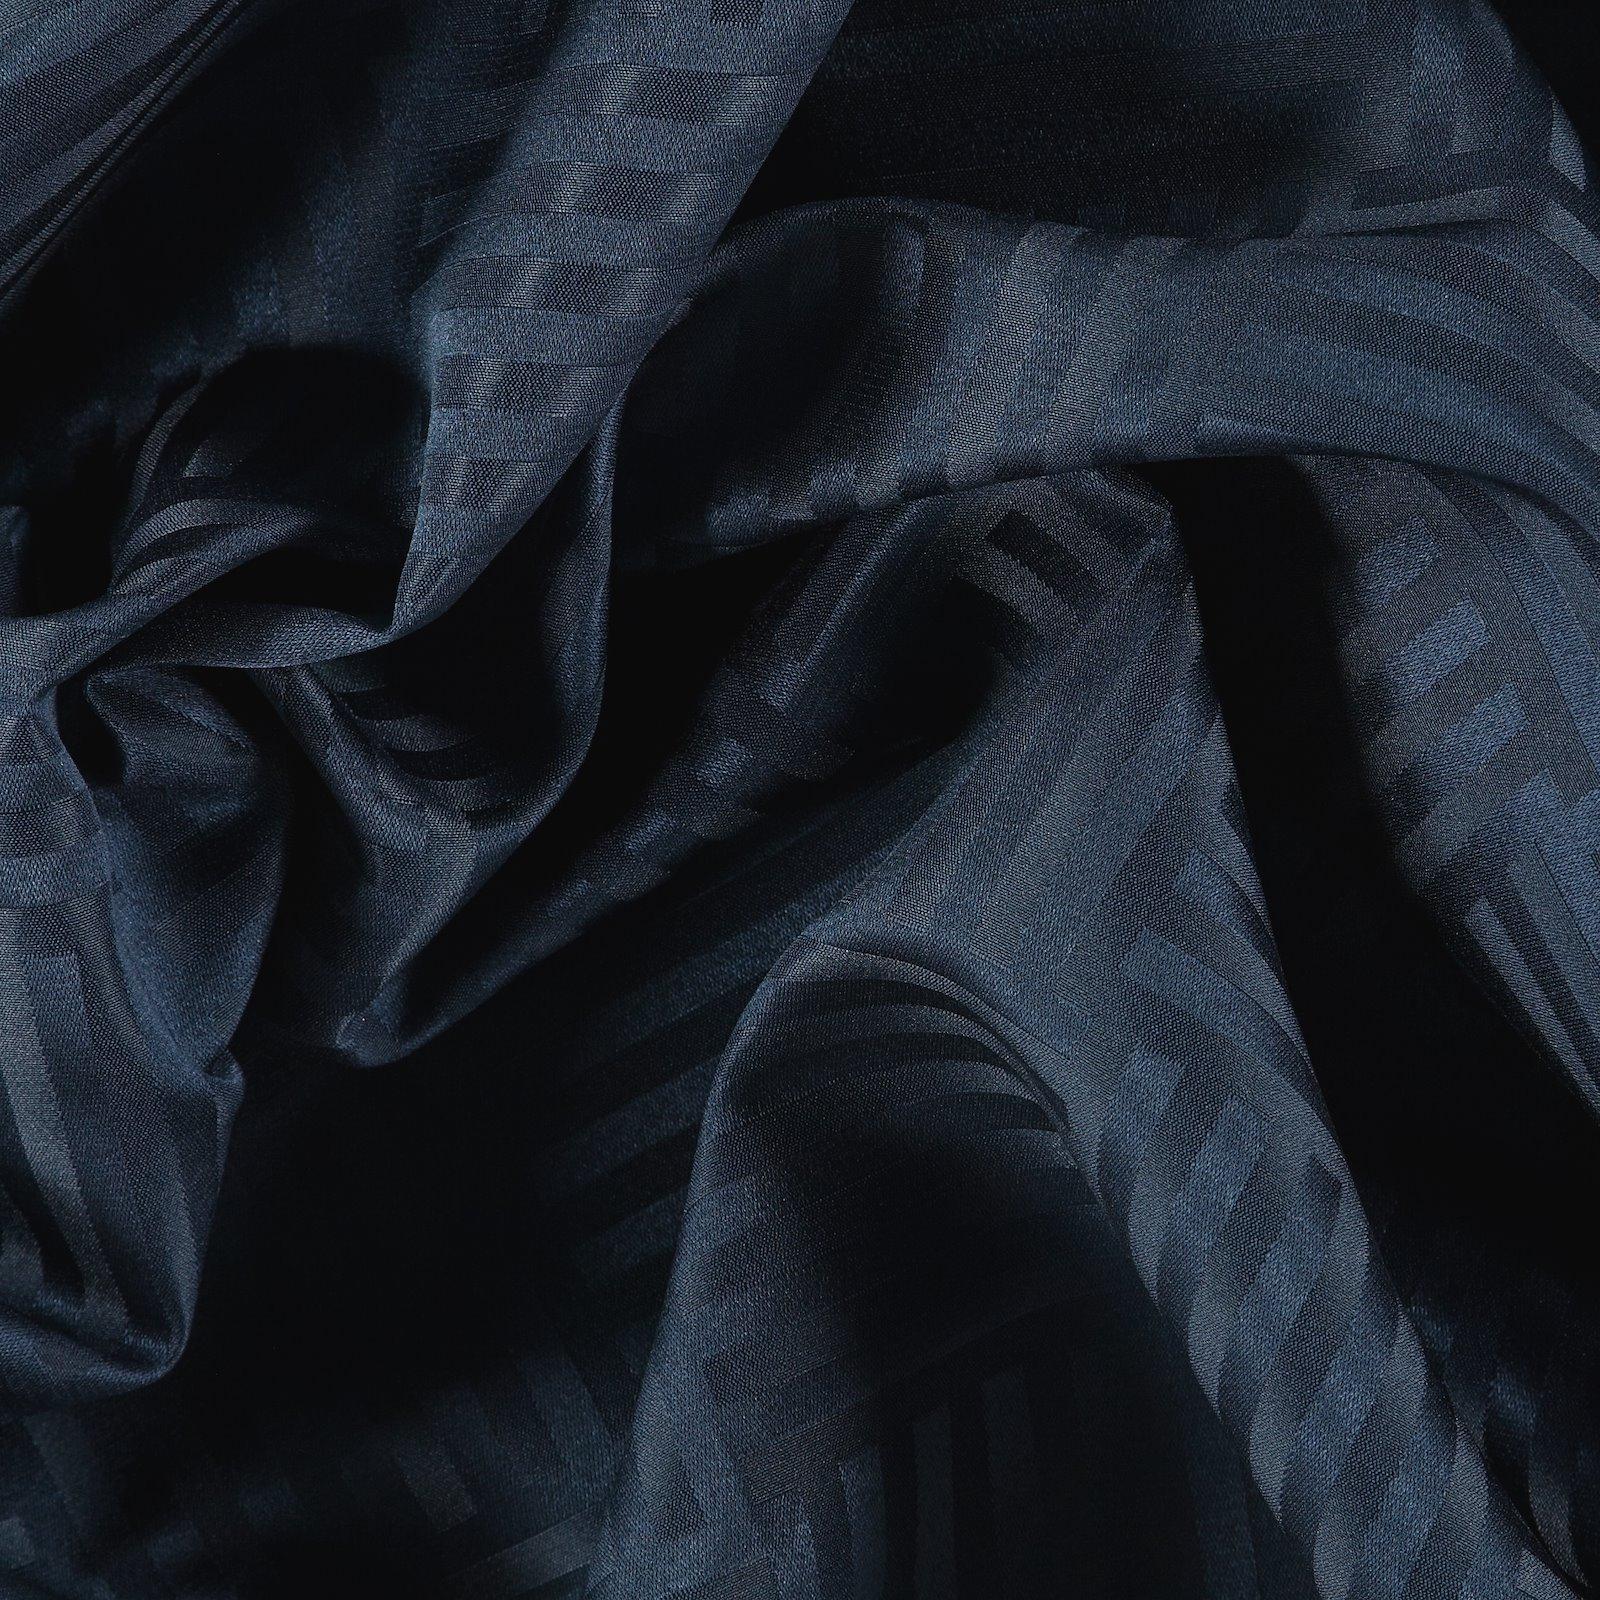 Jacquard navy blue graphic pattern